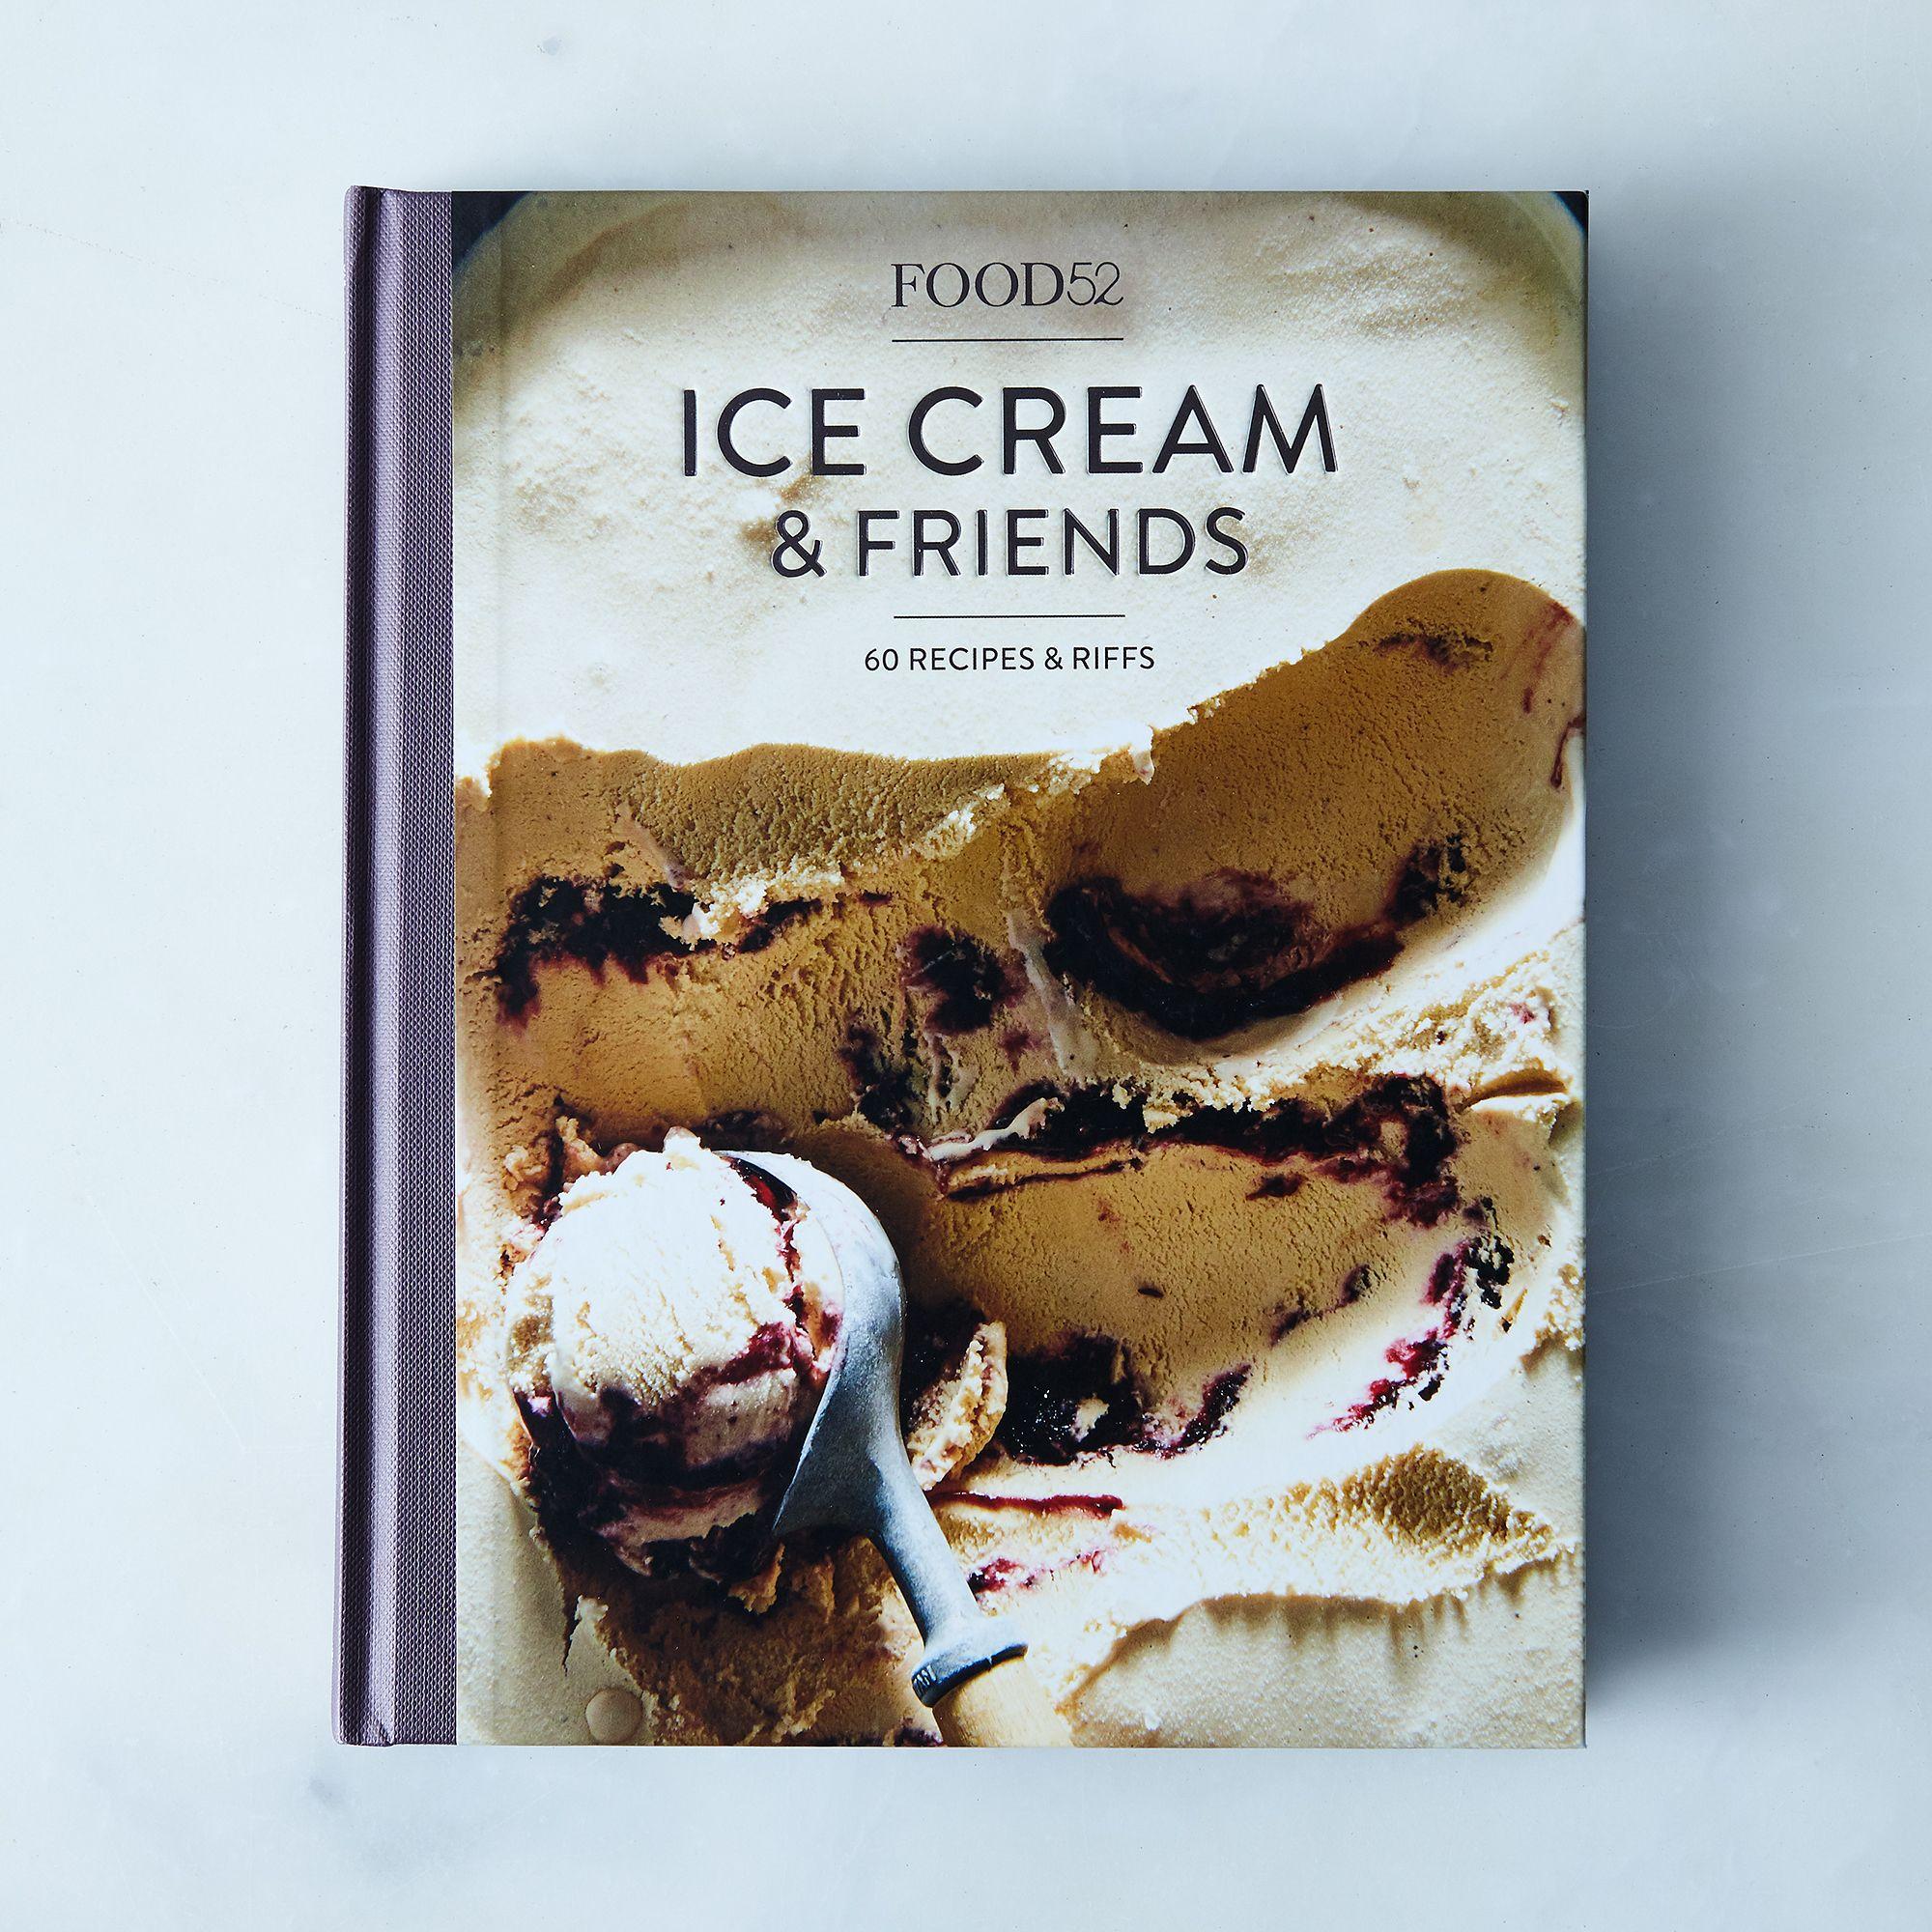 Signed Copy: Food52 Ice Cream & Friends - Ice Cream & Friends